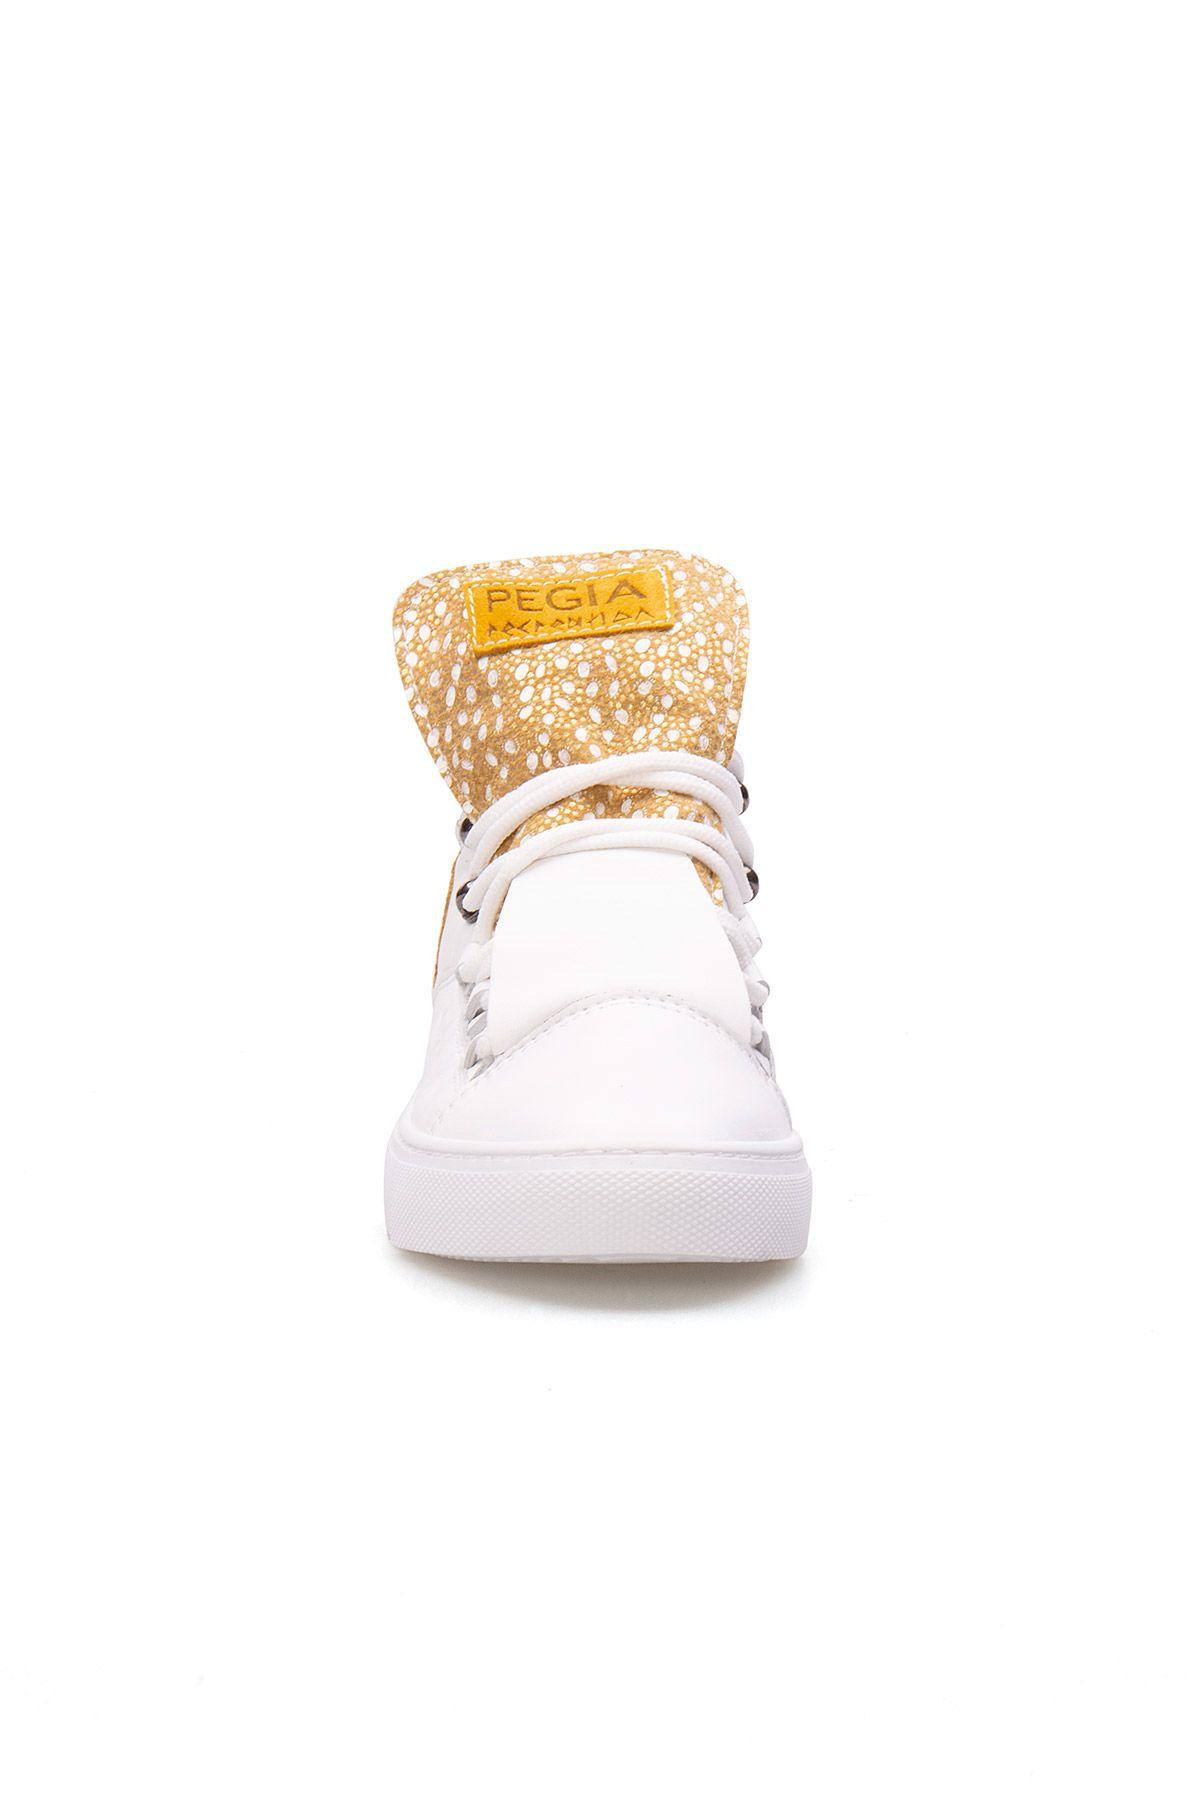 Pegia Genuine Leather Women's Sneaker LA1312 Yellow